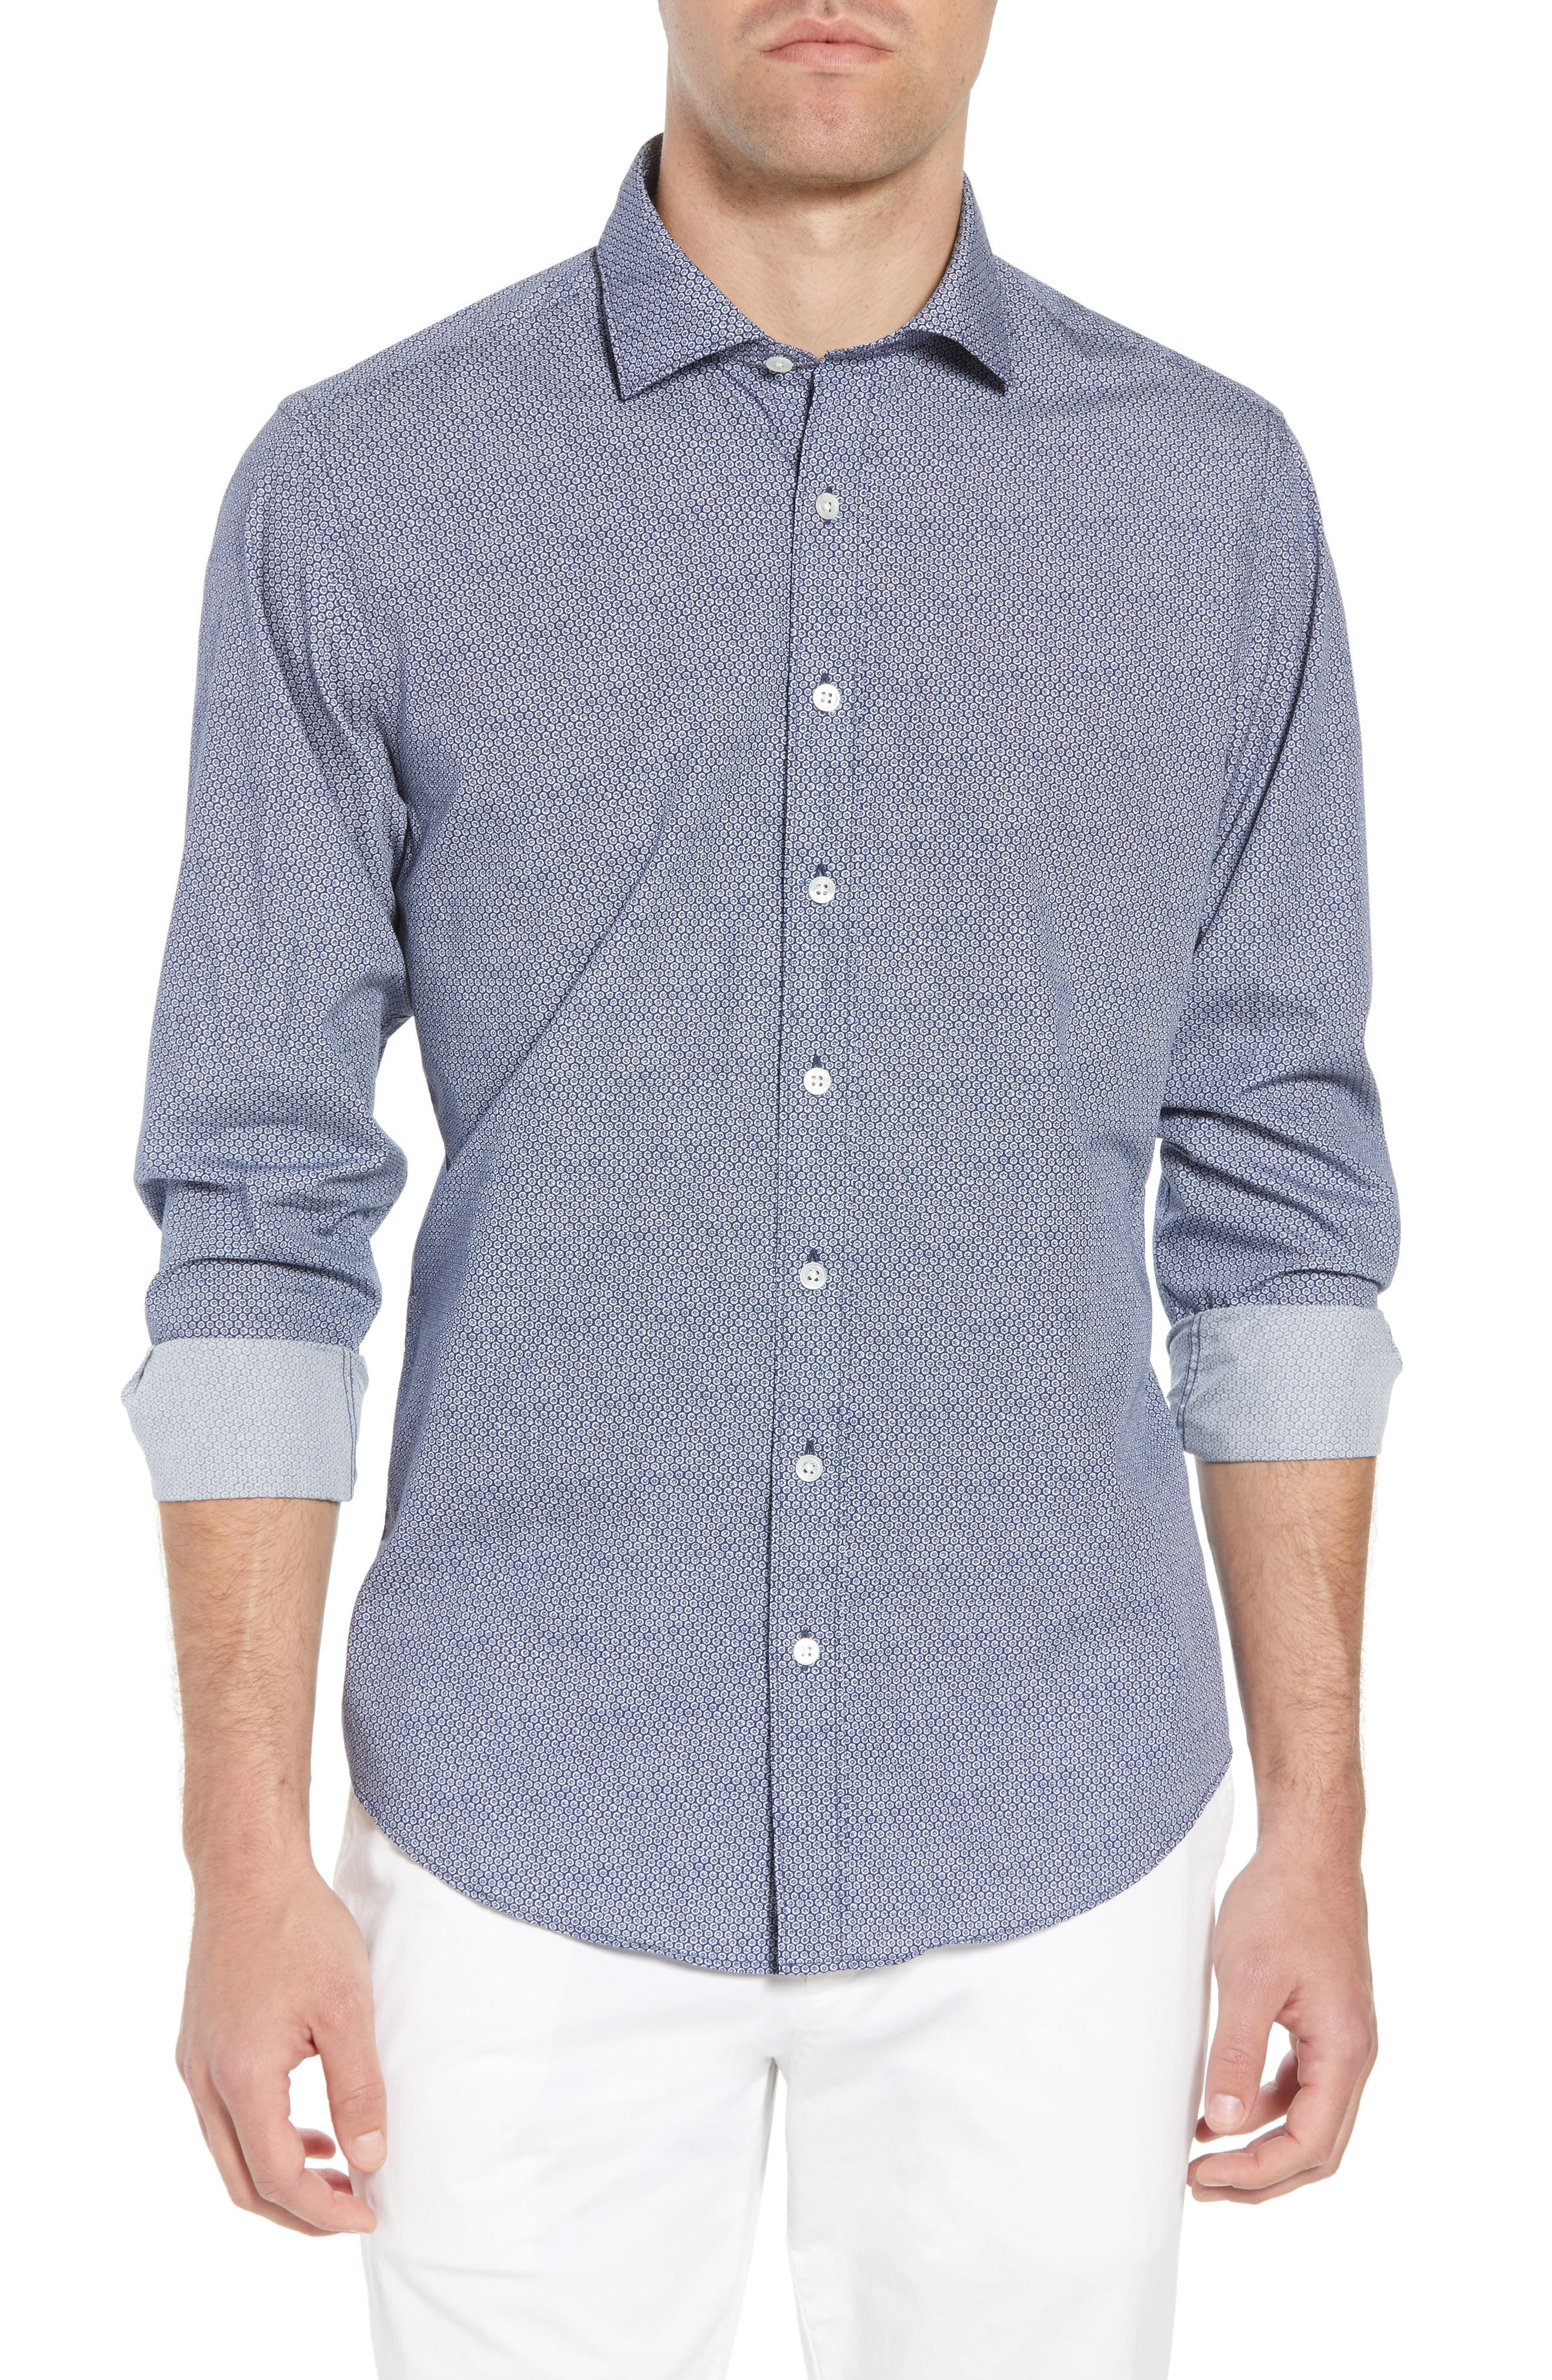 Beacon Point Regular Fit Sport Shirt,                             Main thumbnail 1, color,                             Navy